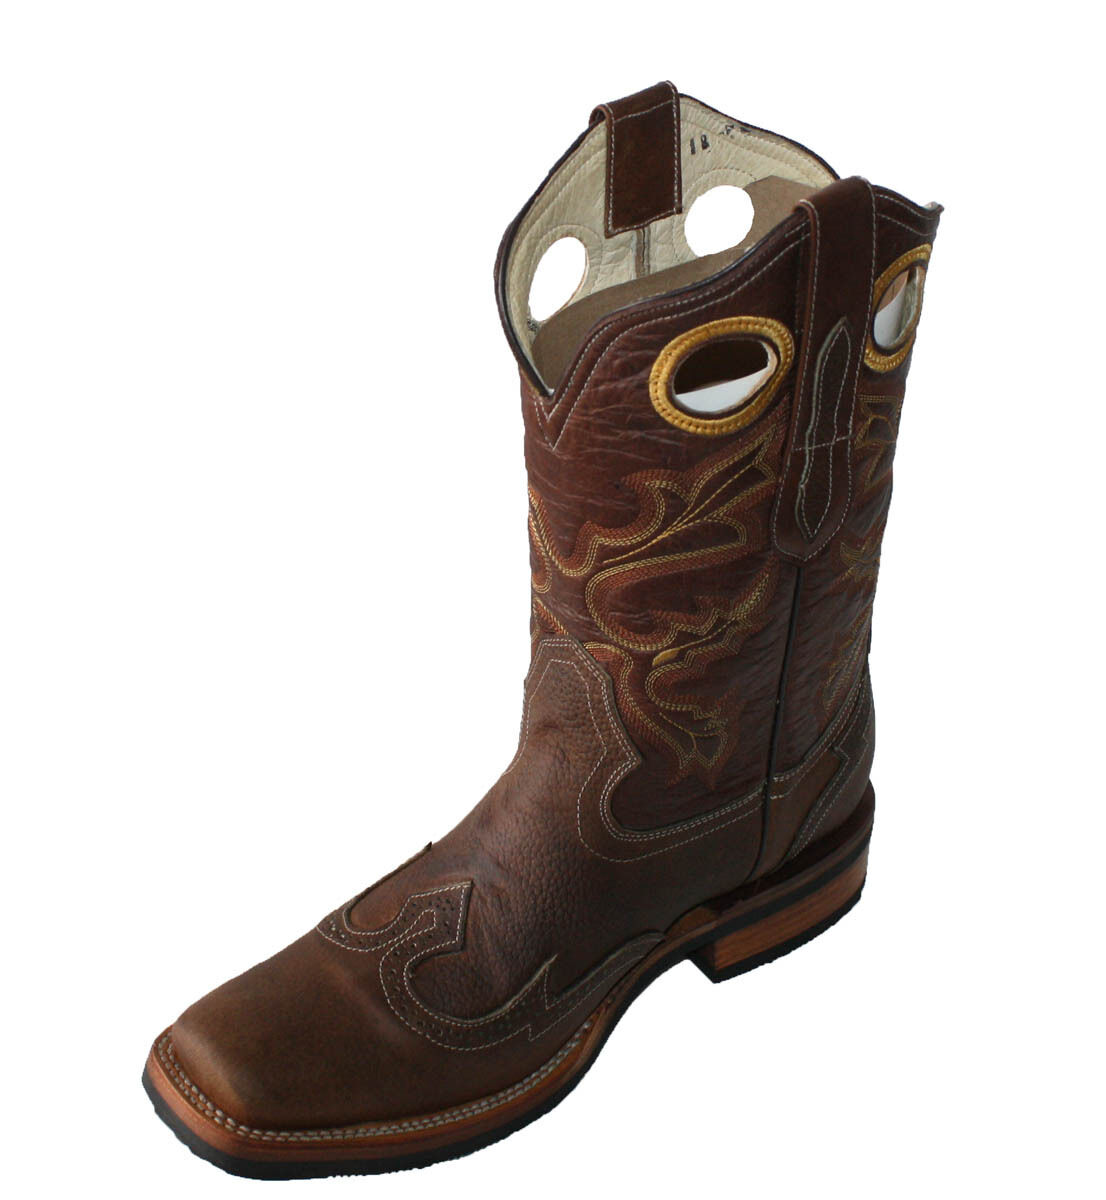 vendita online uomo WORK stivali RODEO LEATHER COWBOY COWBOY COWBOY WESTERN BIKER stivali LIGHT Marrone StyleCB101  il prezzo più basso